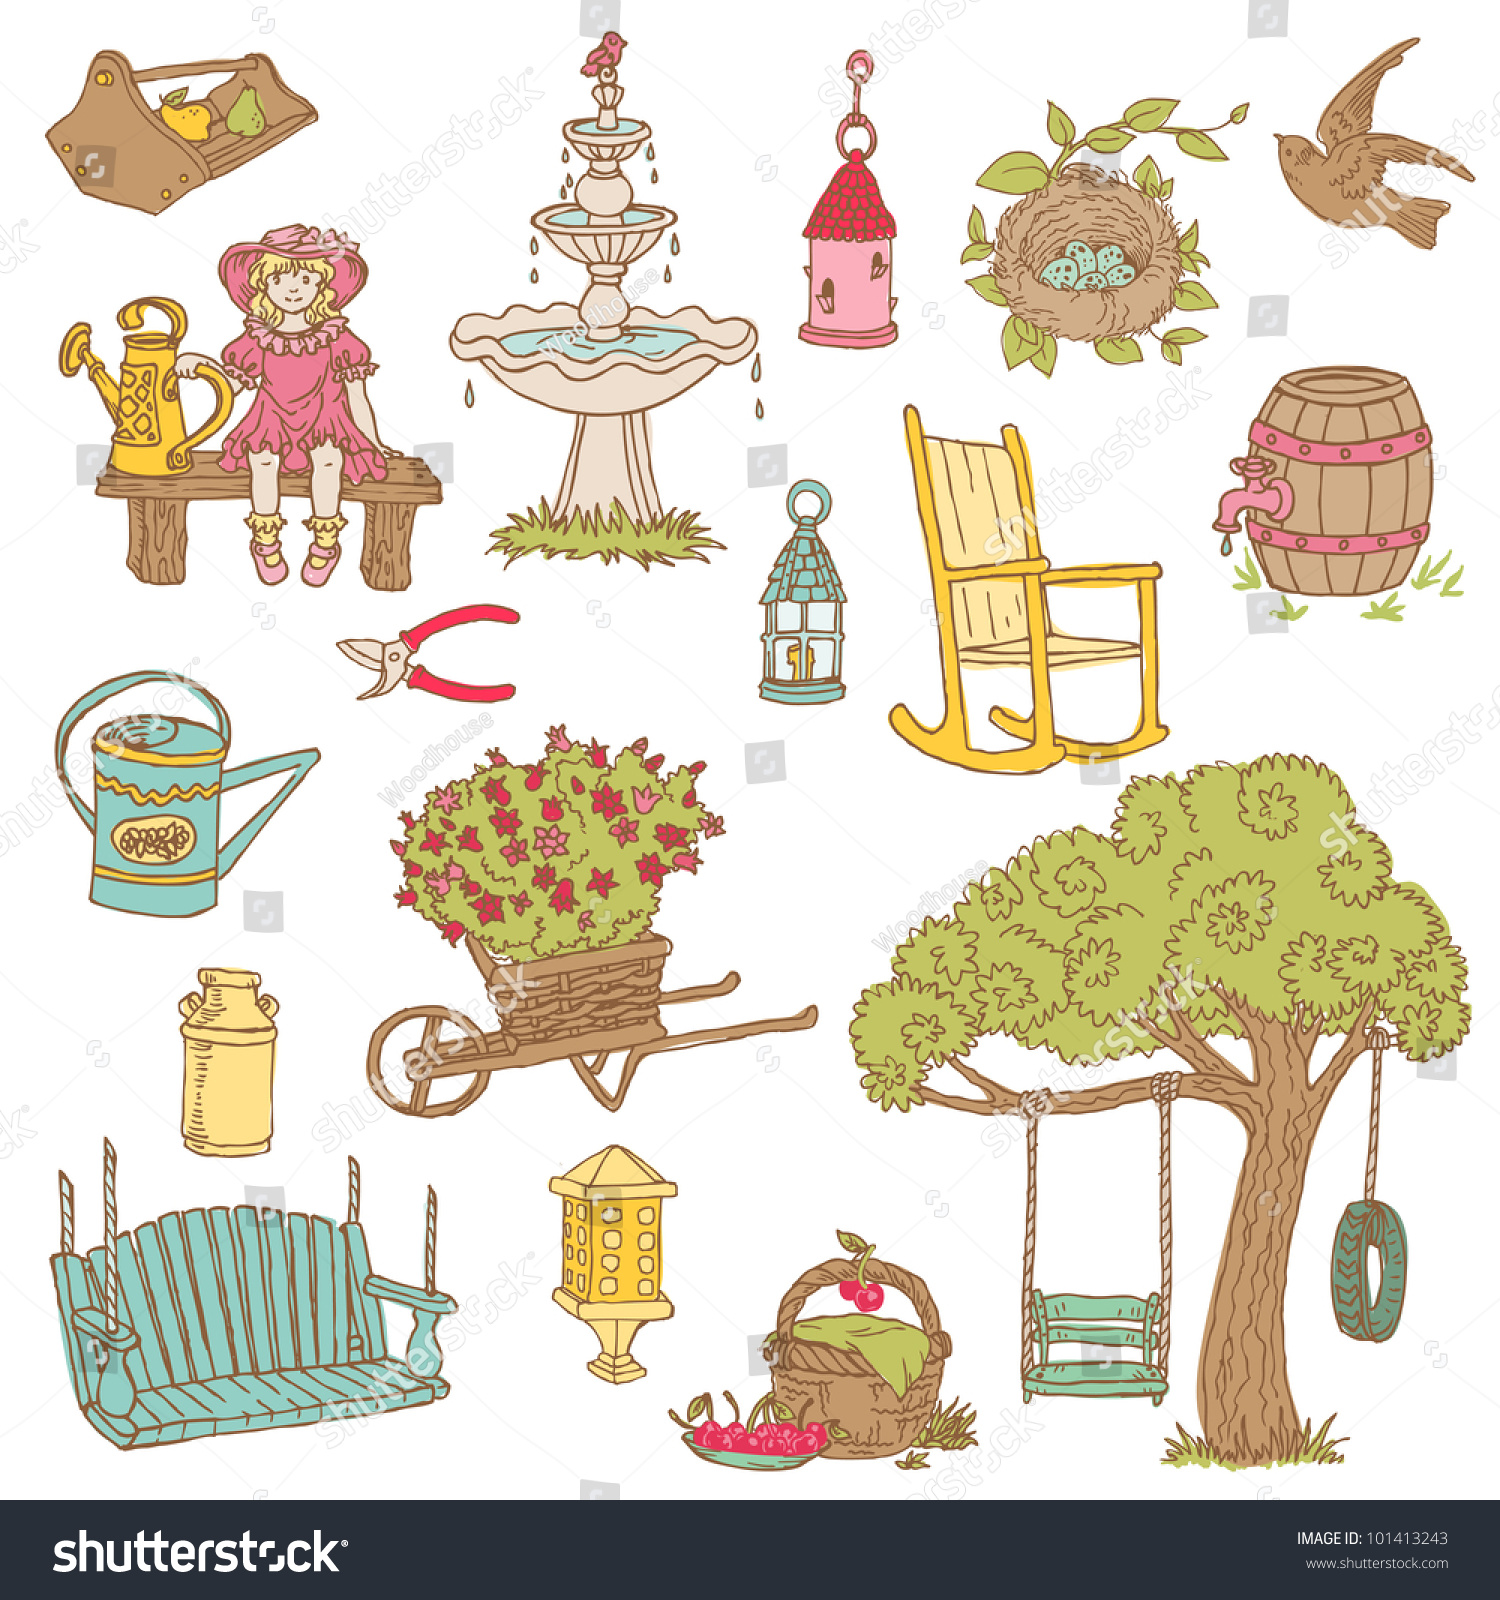 Garden Stock Image Image Of Design: Colorful Summer Garden Doodles